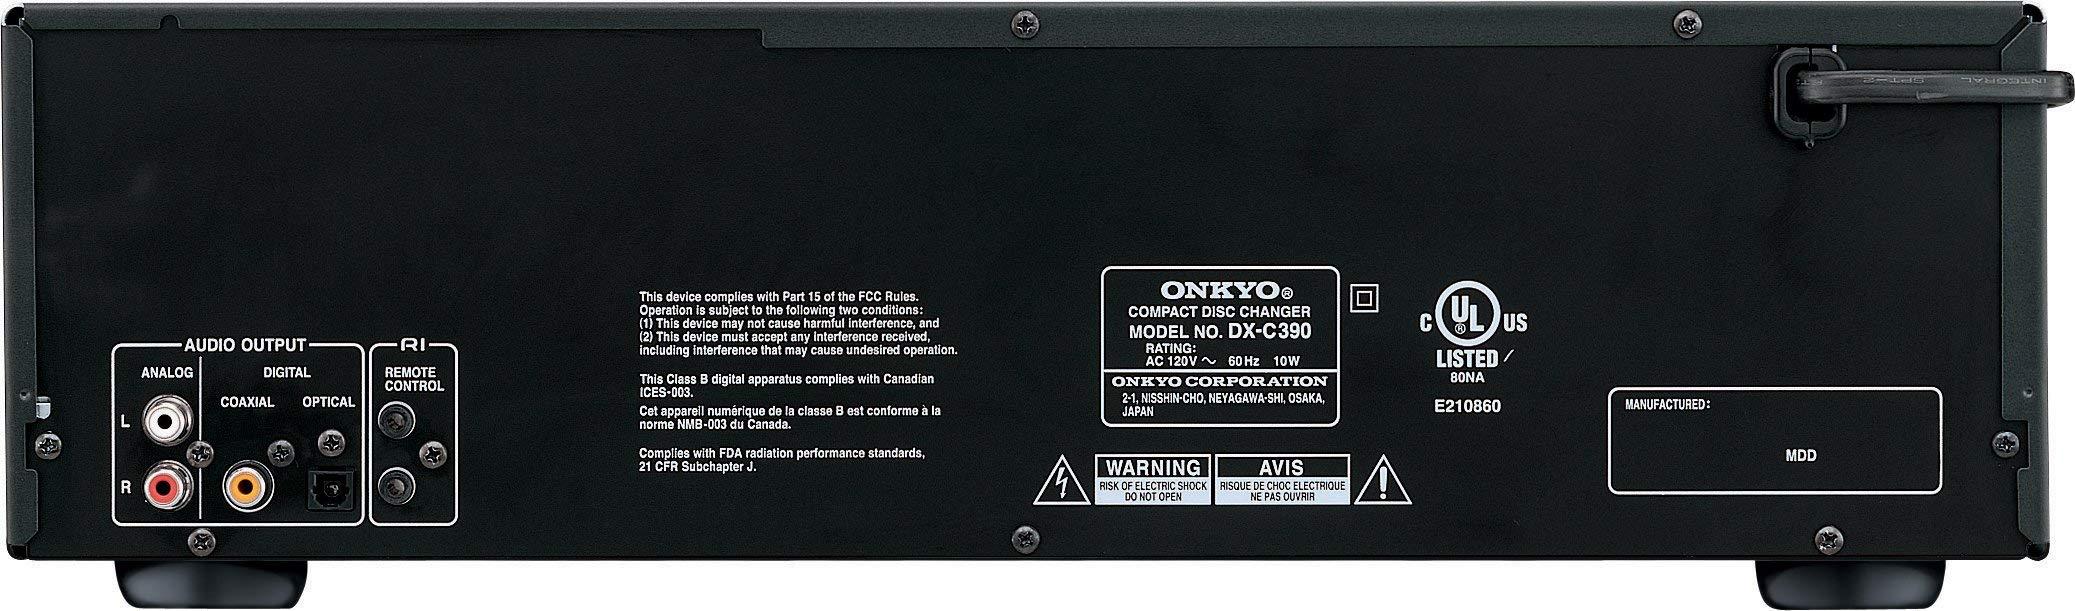 Onkyo DXC390 6 Disc CD Changer (Renewed) by Onkyo (Image #2)